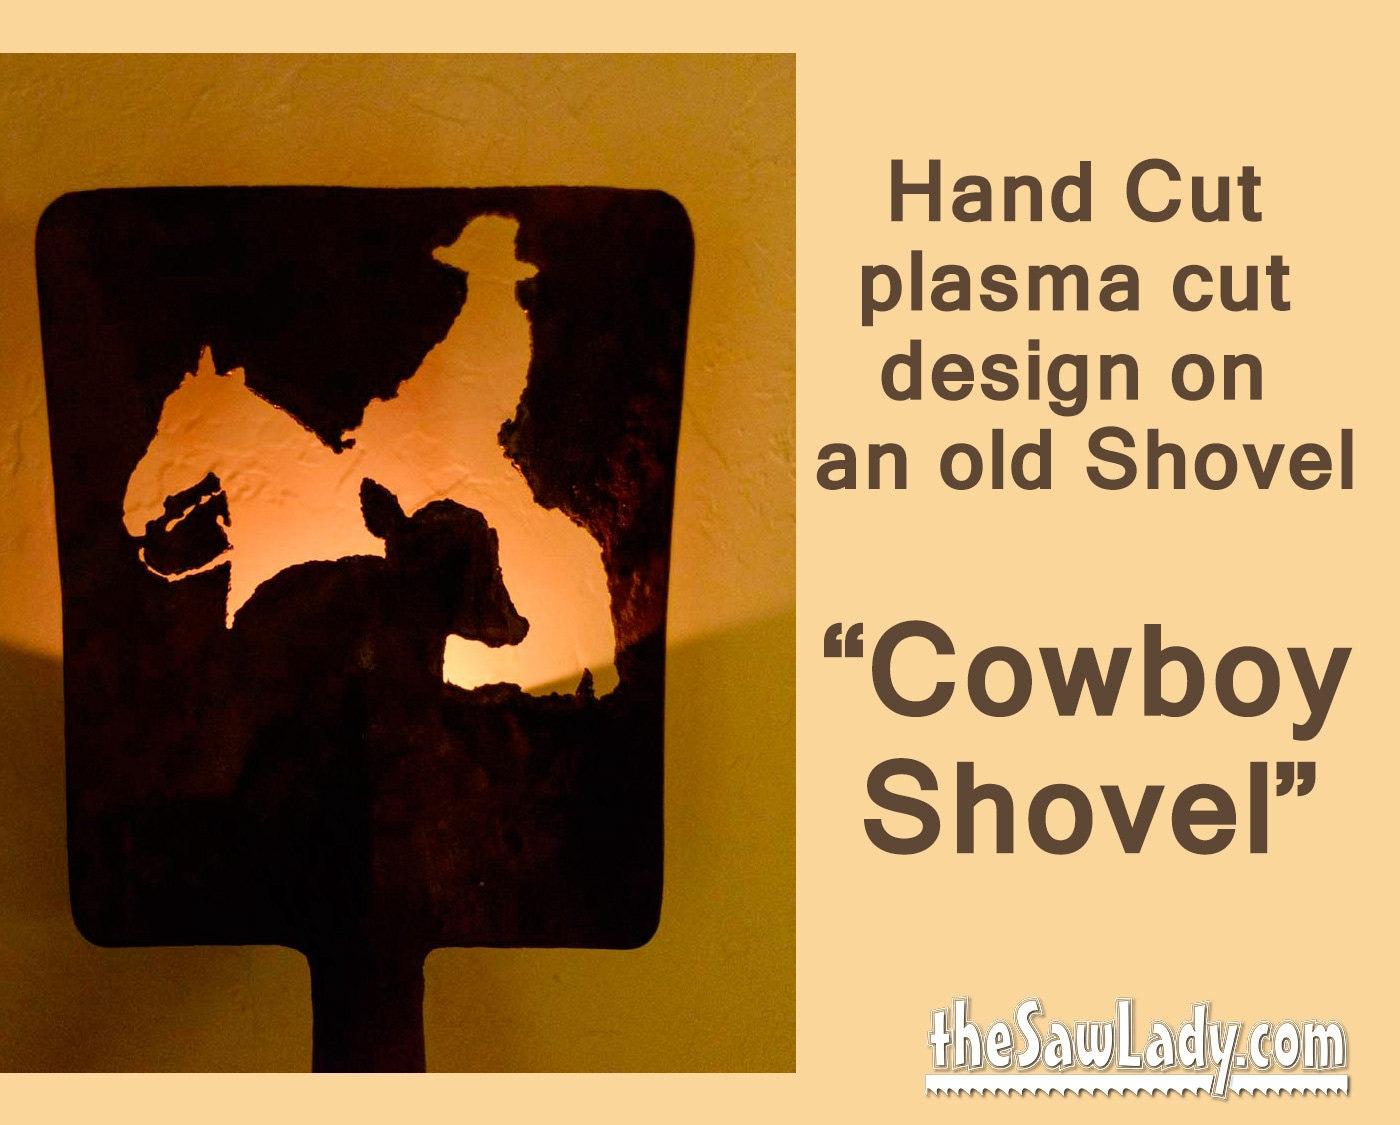 Metal Art Cowboy and Calf design Hand plasma Cut Shovel